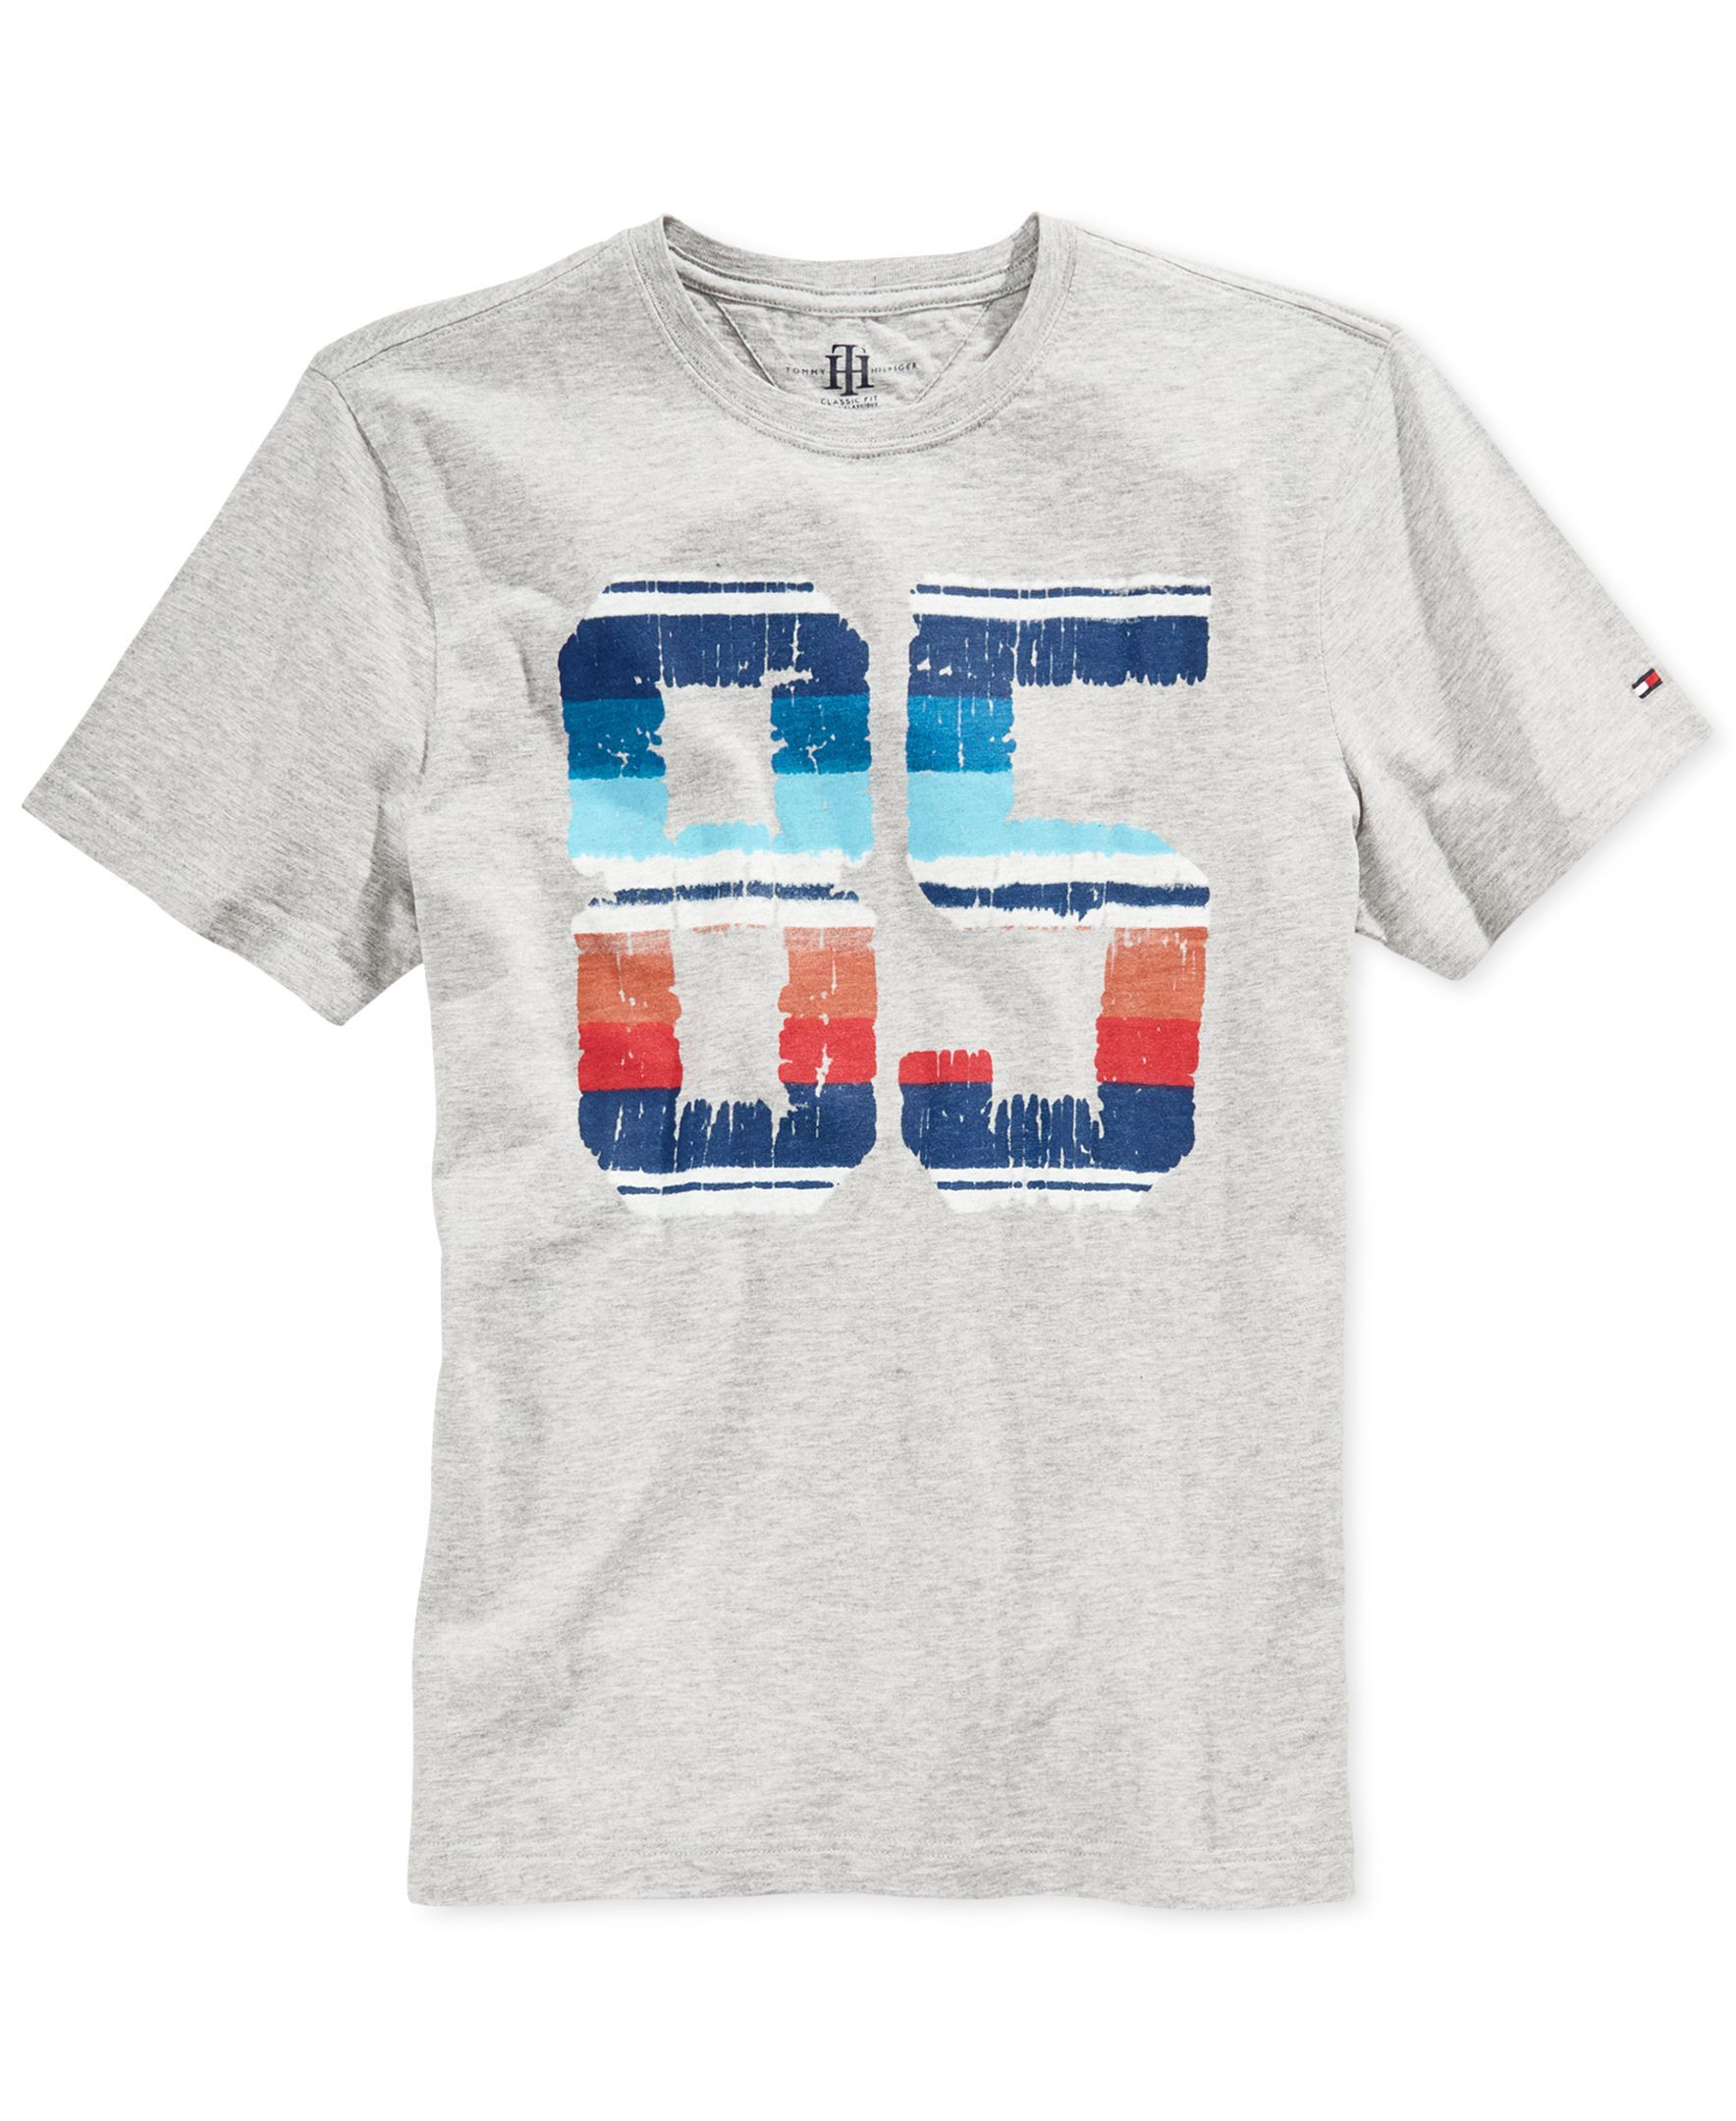 Tommy Hilfiger Mens Old Skool Graphic T Shirt   Wish